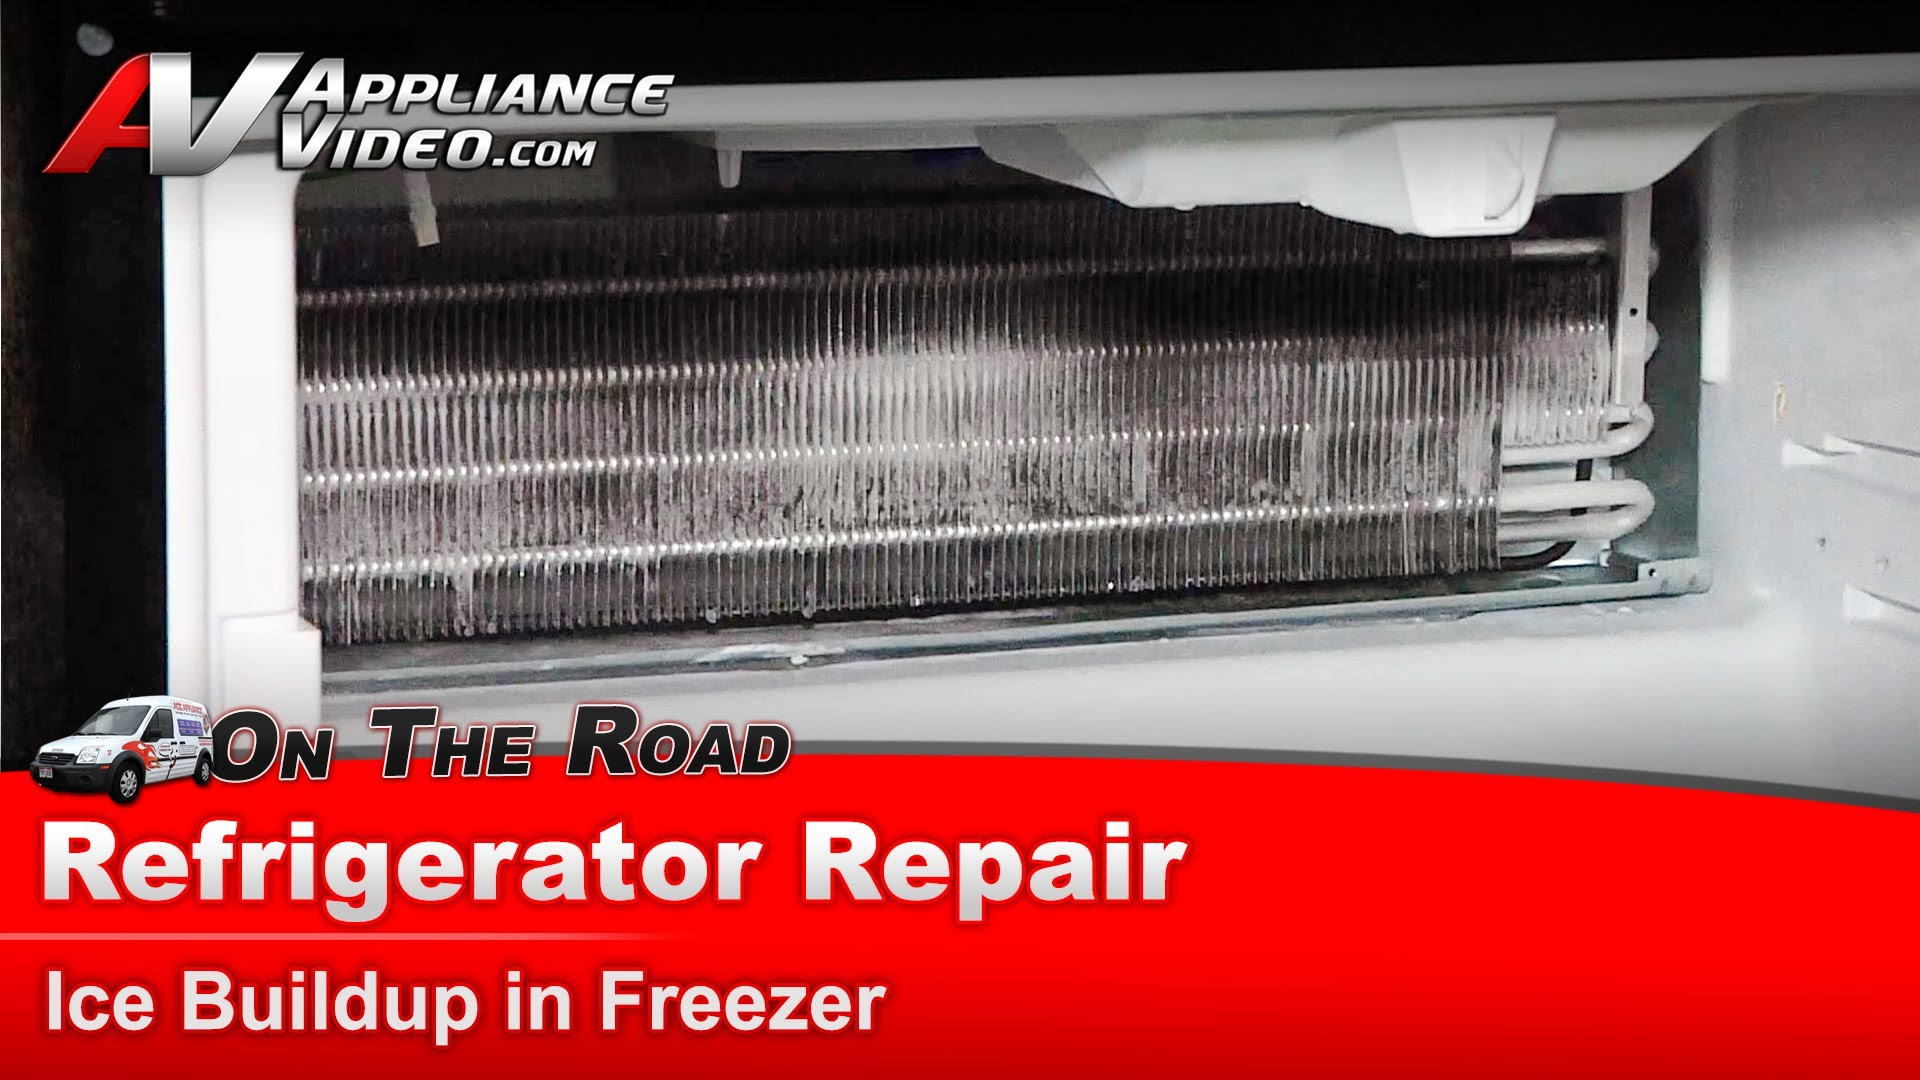 Maytag Mf12665xeb0 Refrigerator Repair Has Ice Buildup